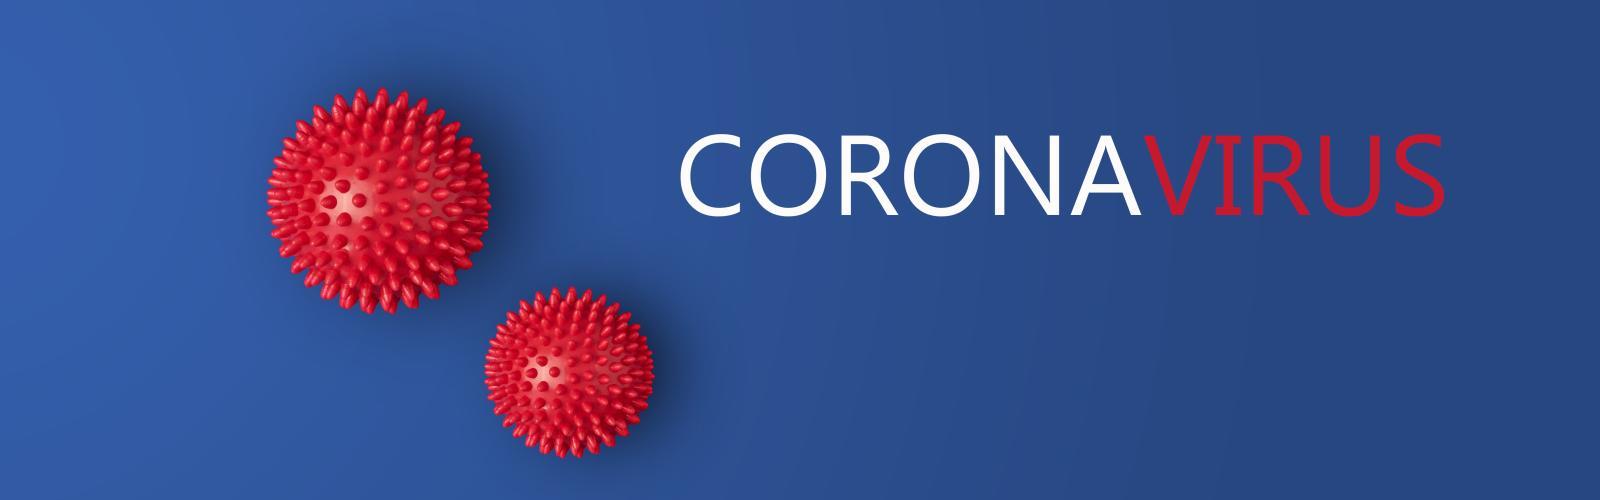 Coronavirus_Header_70439bbe-7e21-41d7-9bff-1704458400df